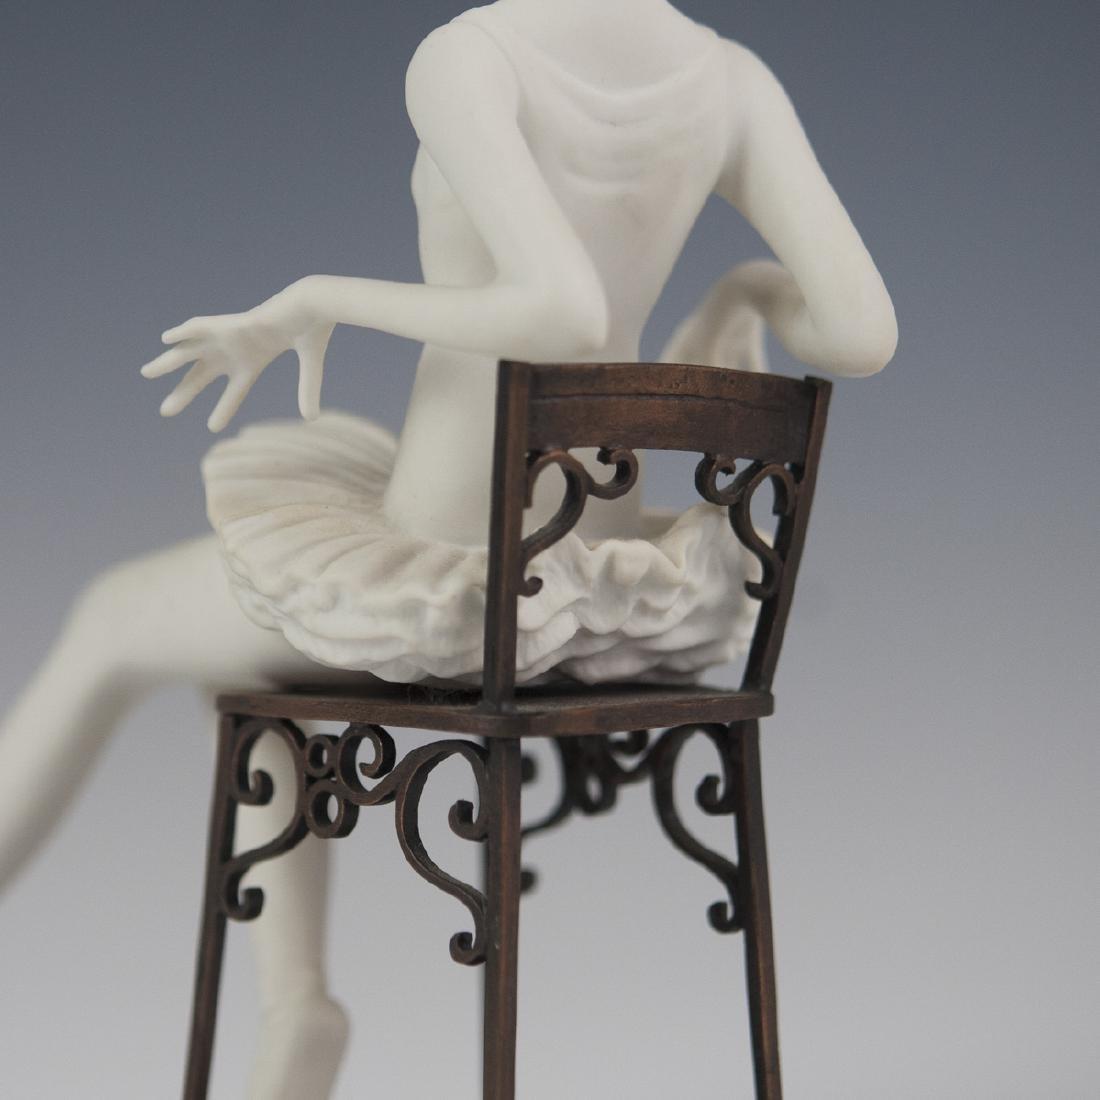 Boehm Porcelain Figurine - 5